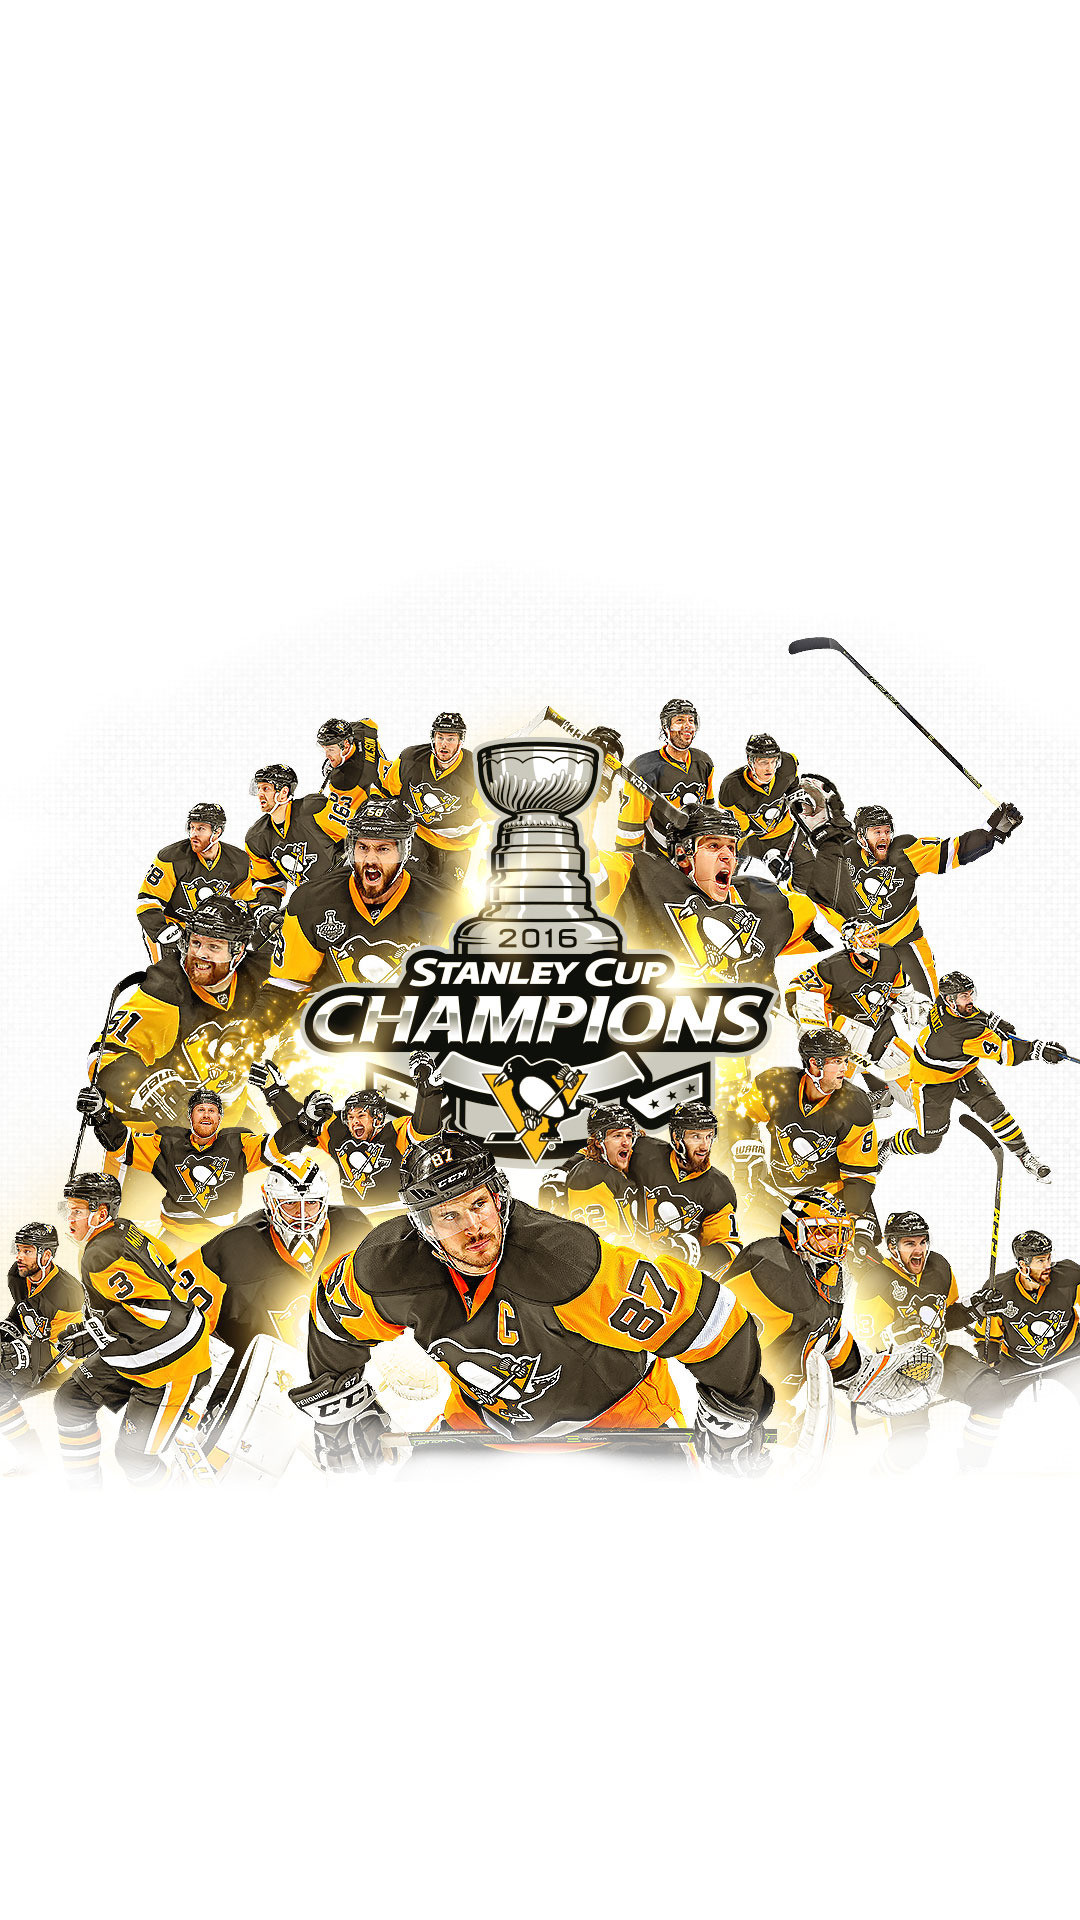 Pittsburgh Penguins Screensavers Wallpapers | HD Wallpapers | Pinterest |  Hd wallpaper and Wallpaper